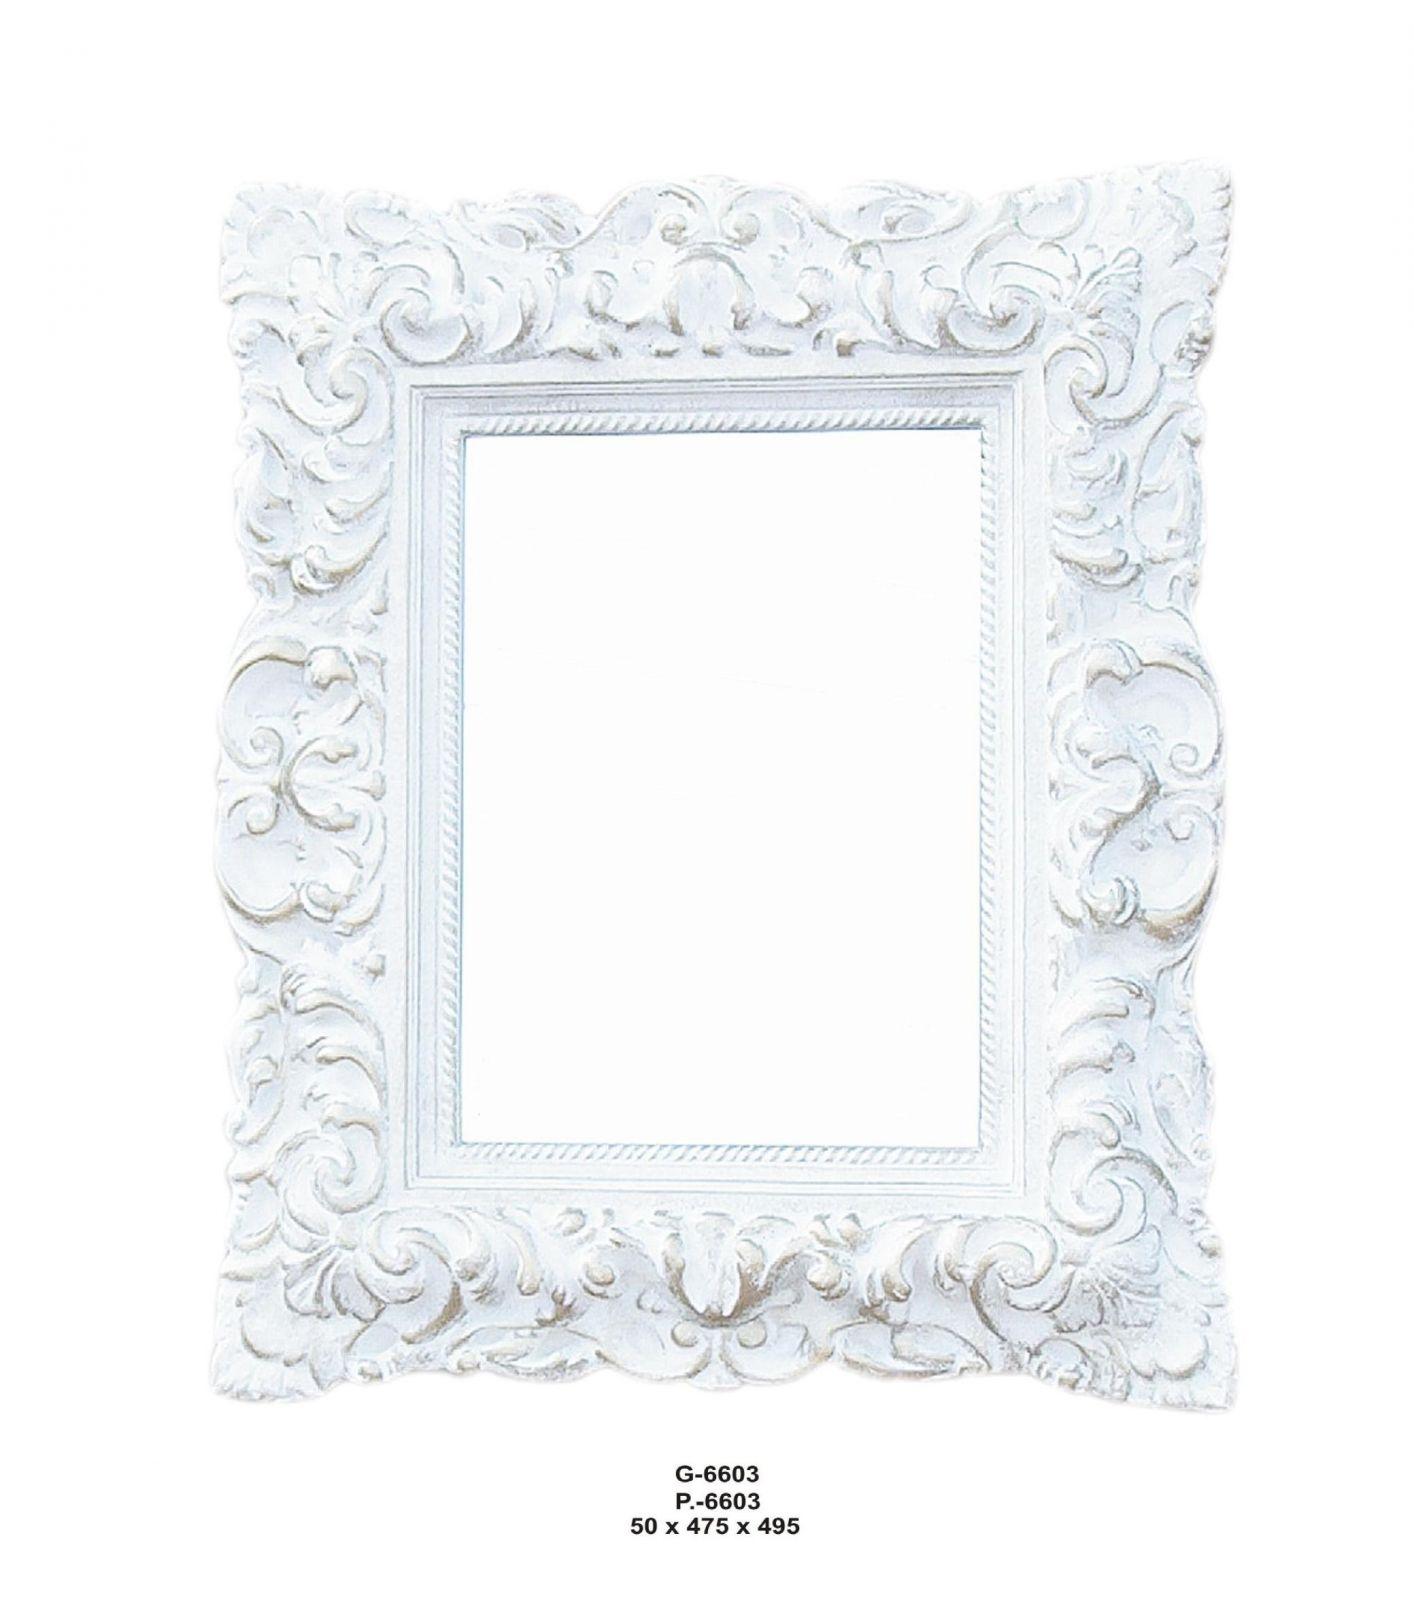 Zrcadlo 47,5x49,5x5cm Zakázková výroba